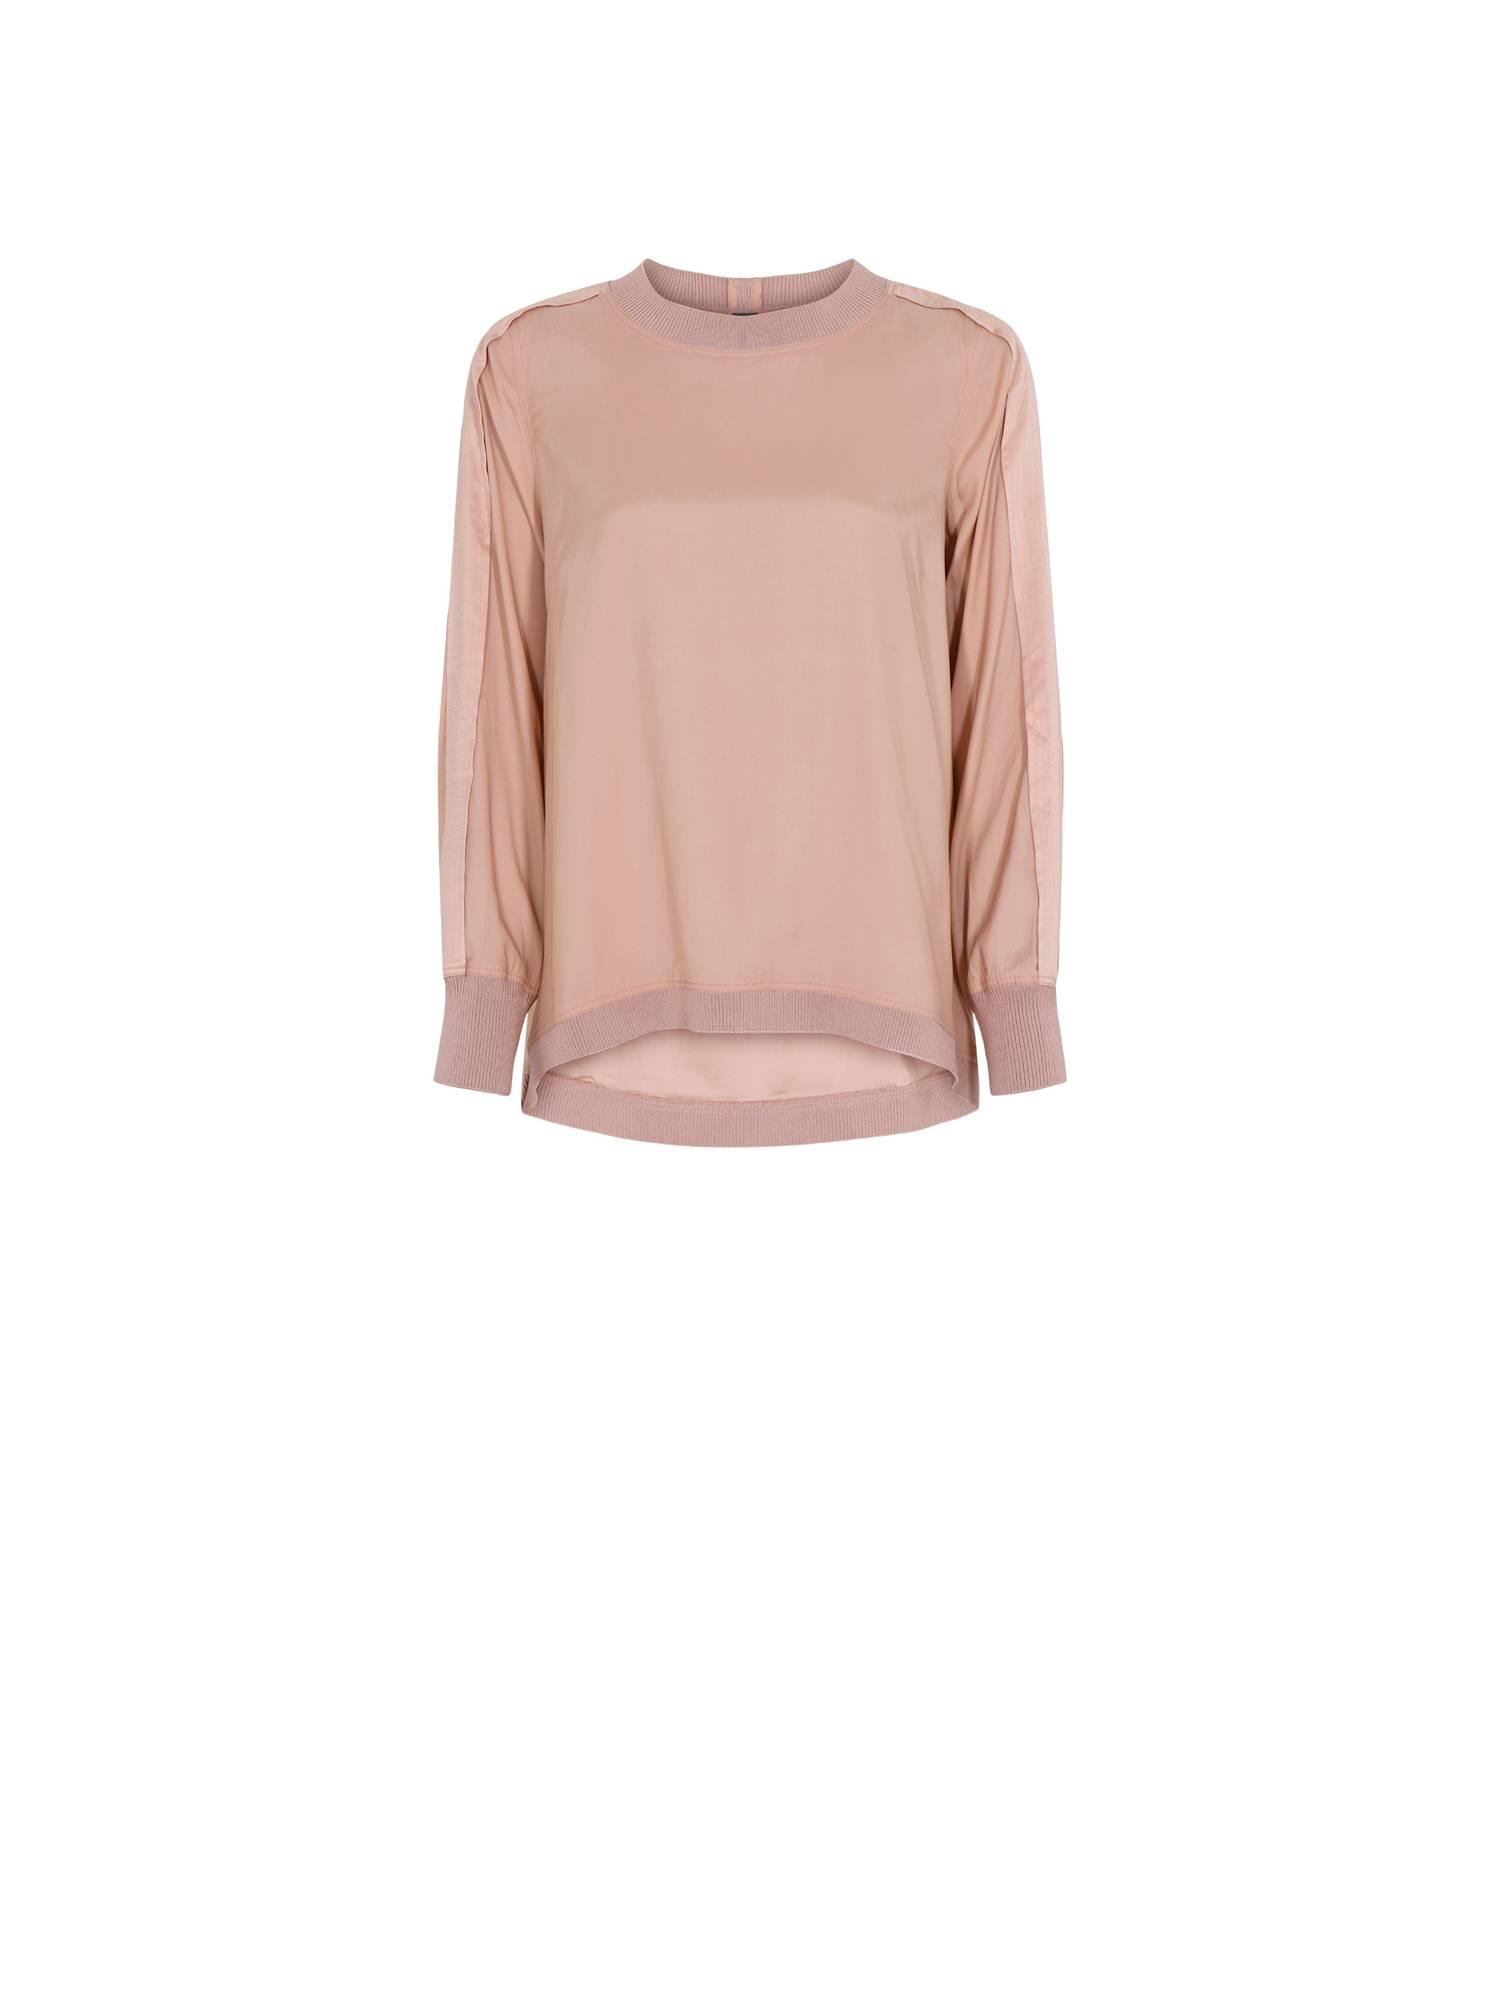 Roze dames top Gustav - 7728-0-6023